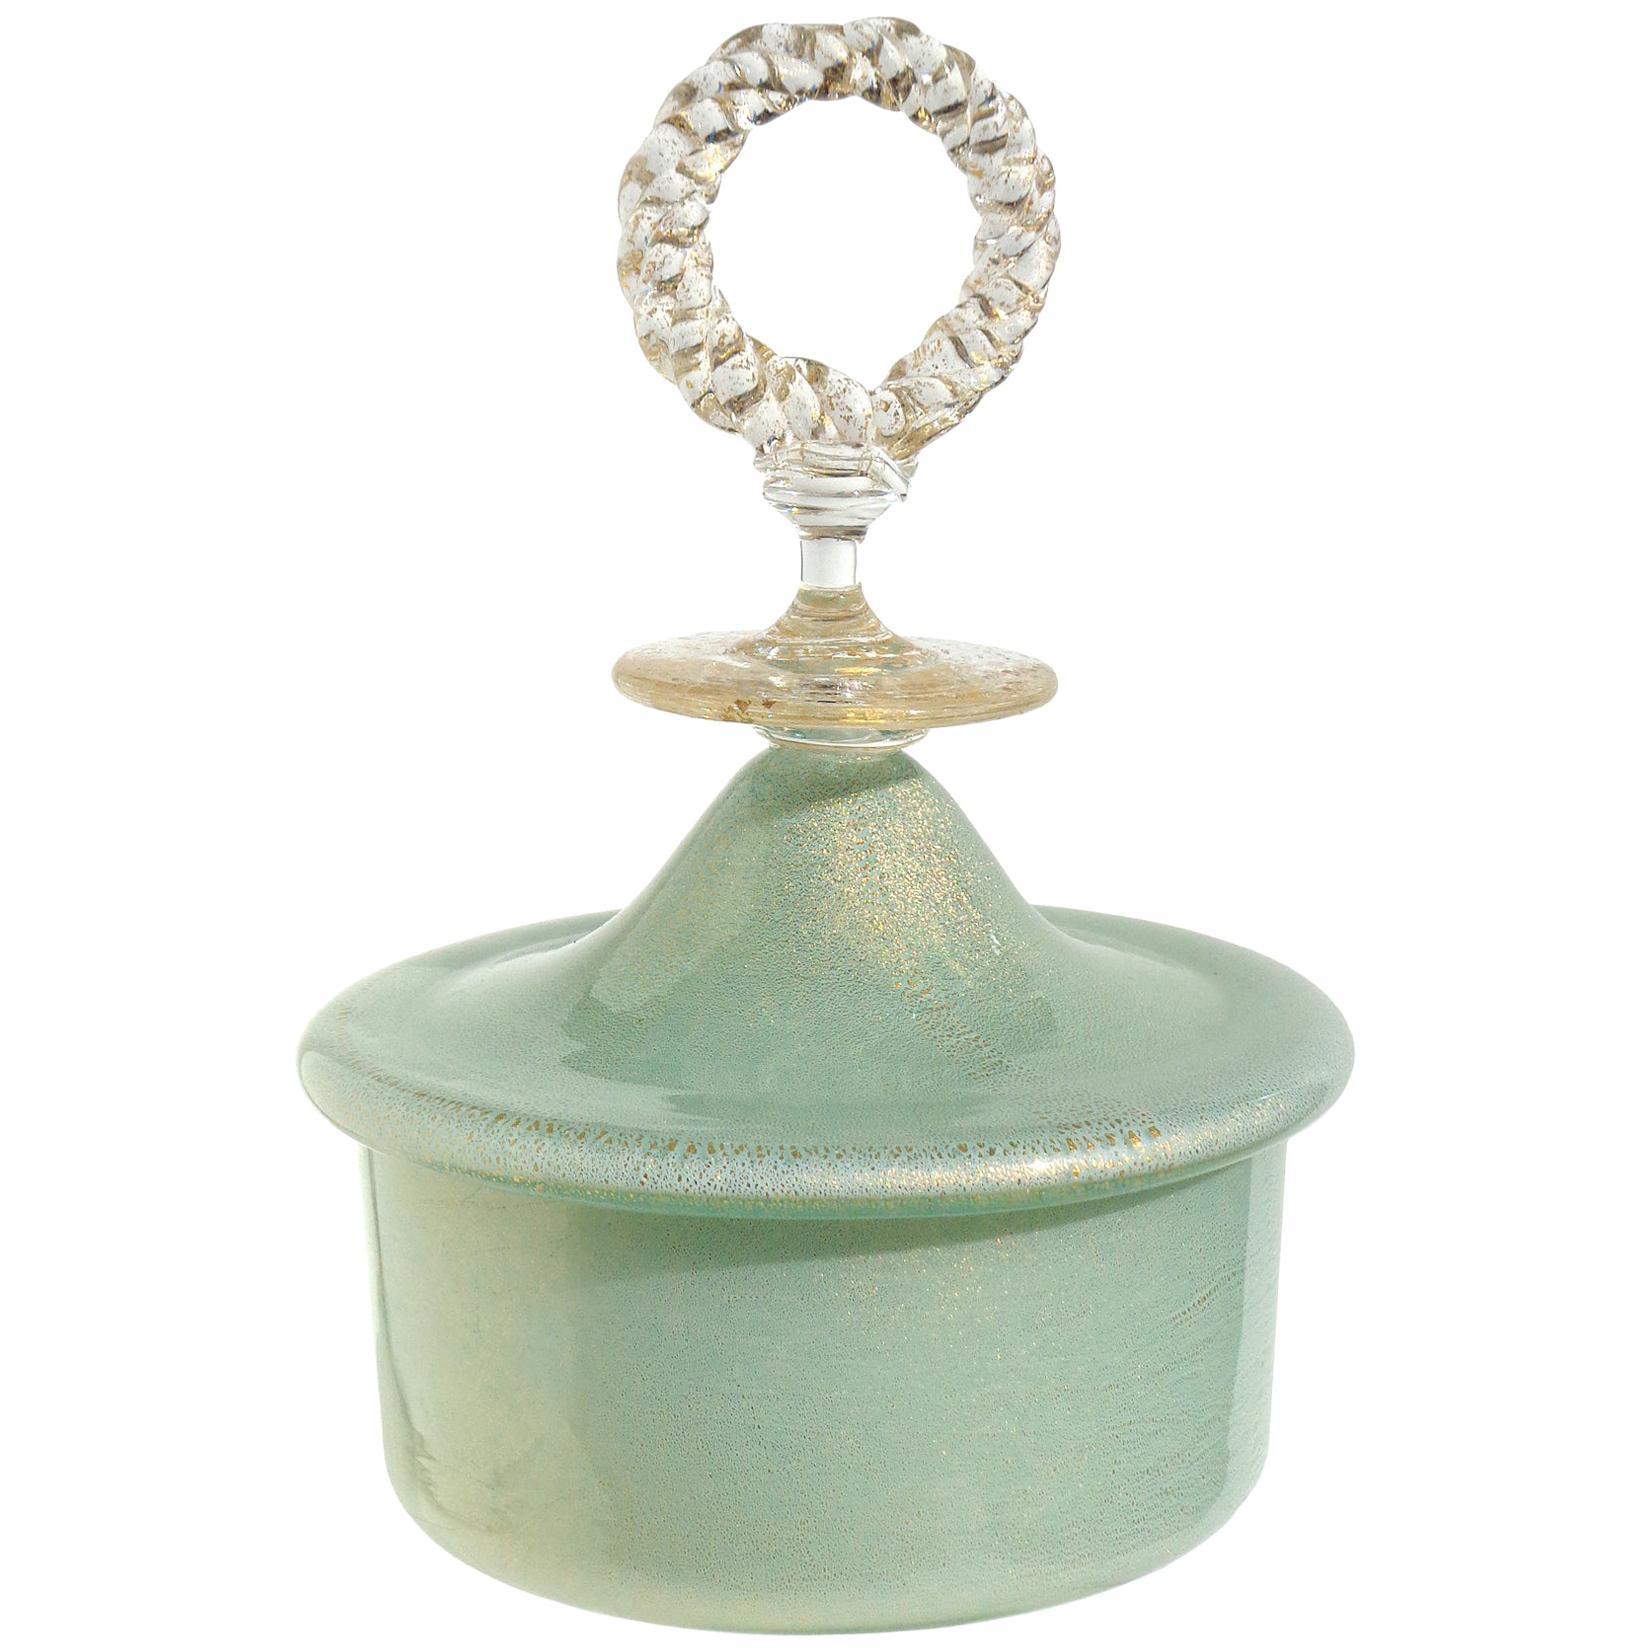 Fratelli Toso Murano Light Green Gold Flecks Italian Art Glass Decorative Box